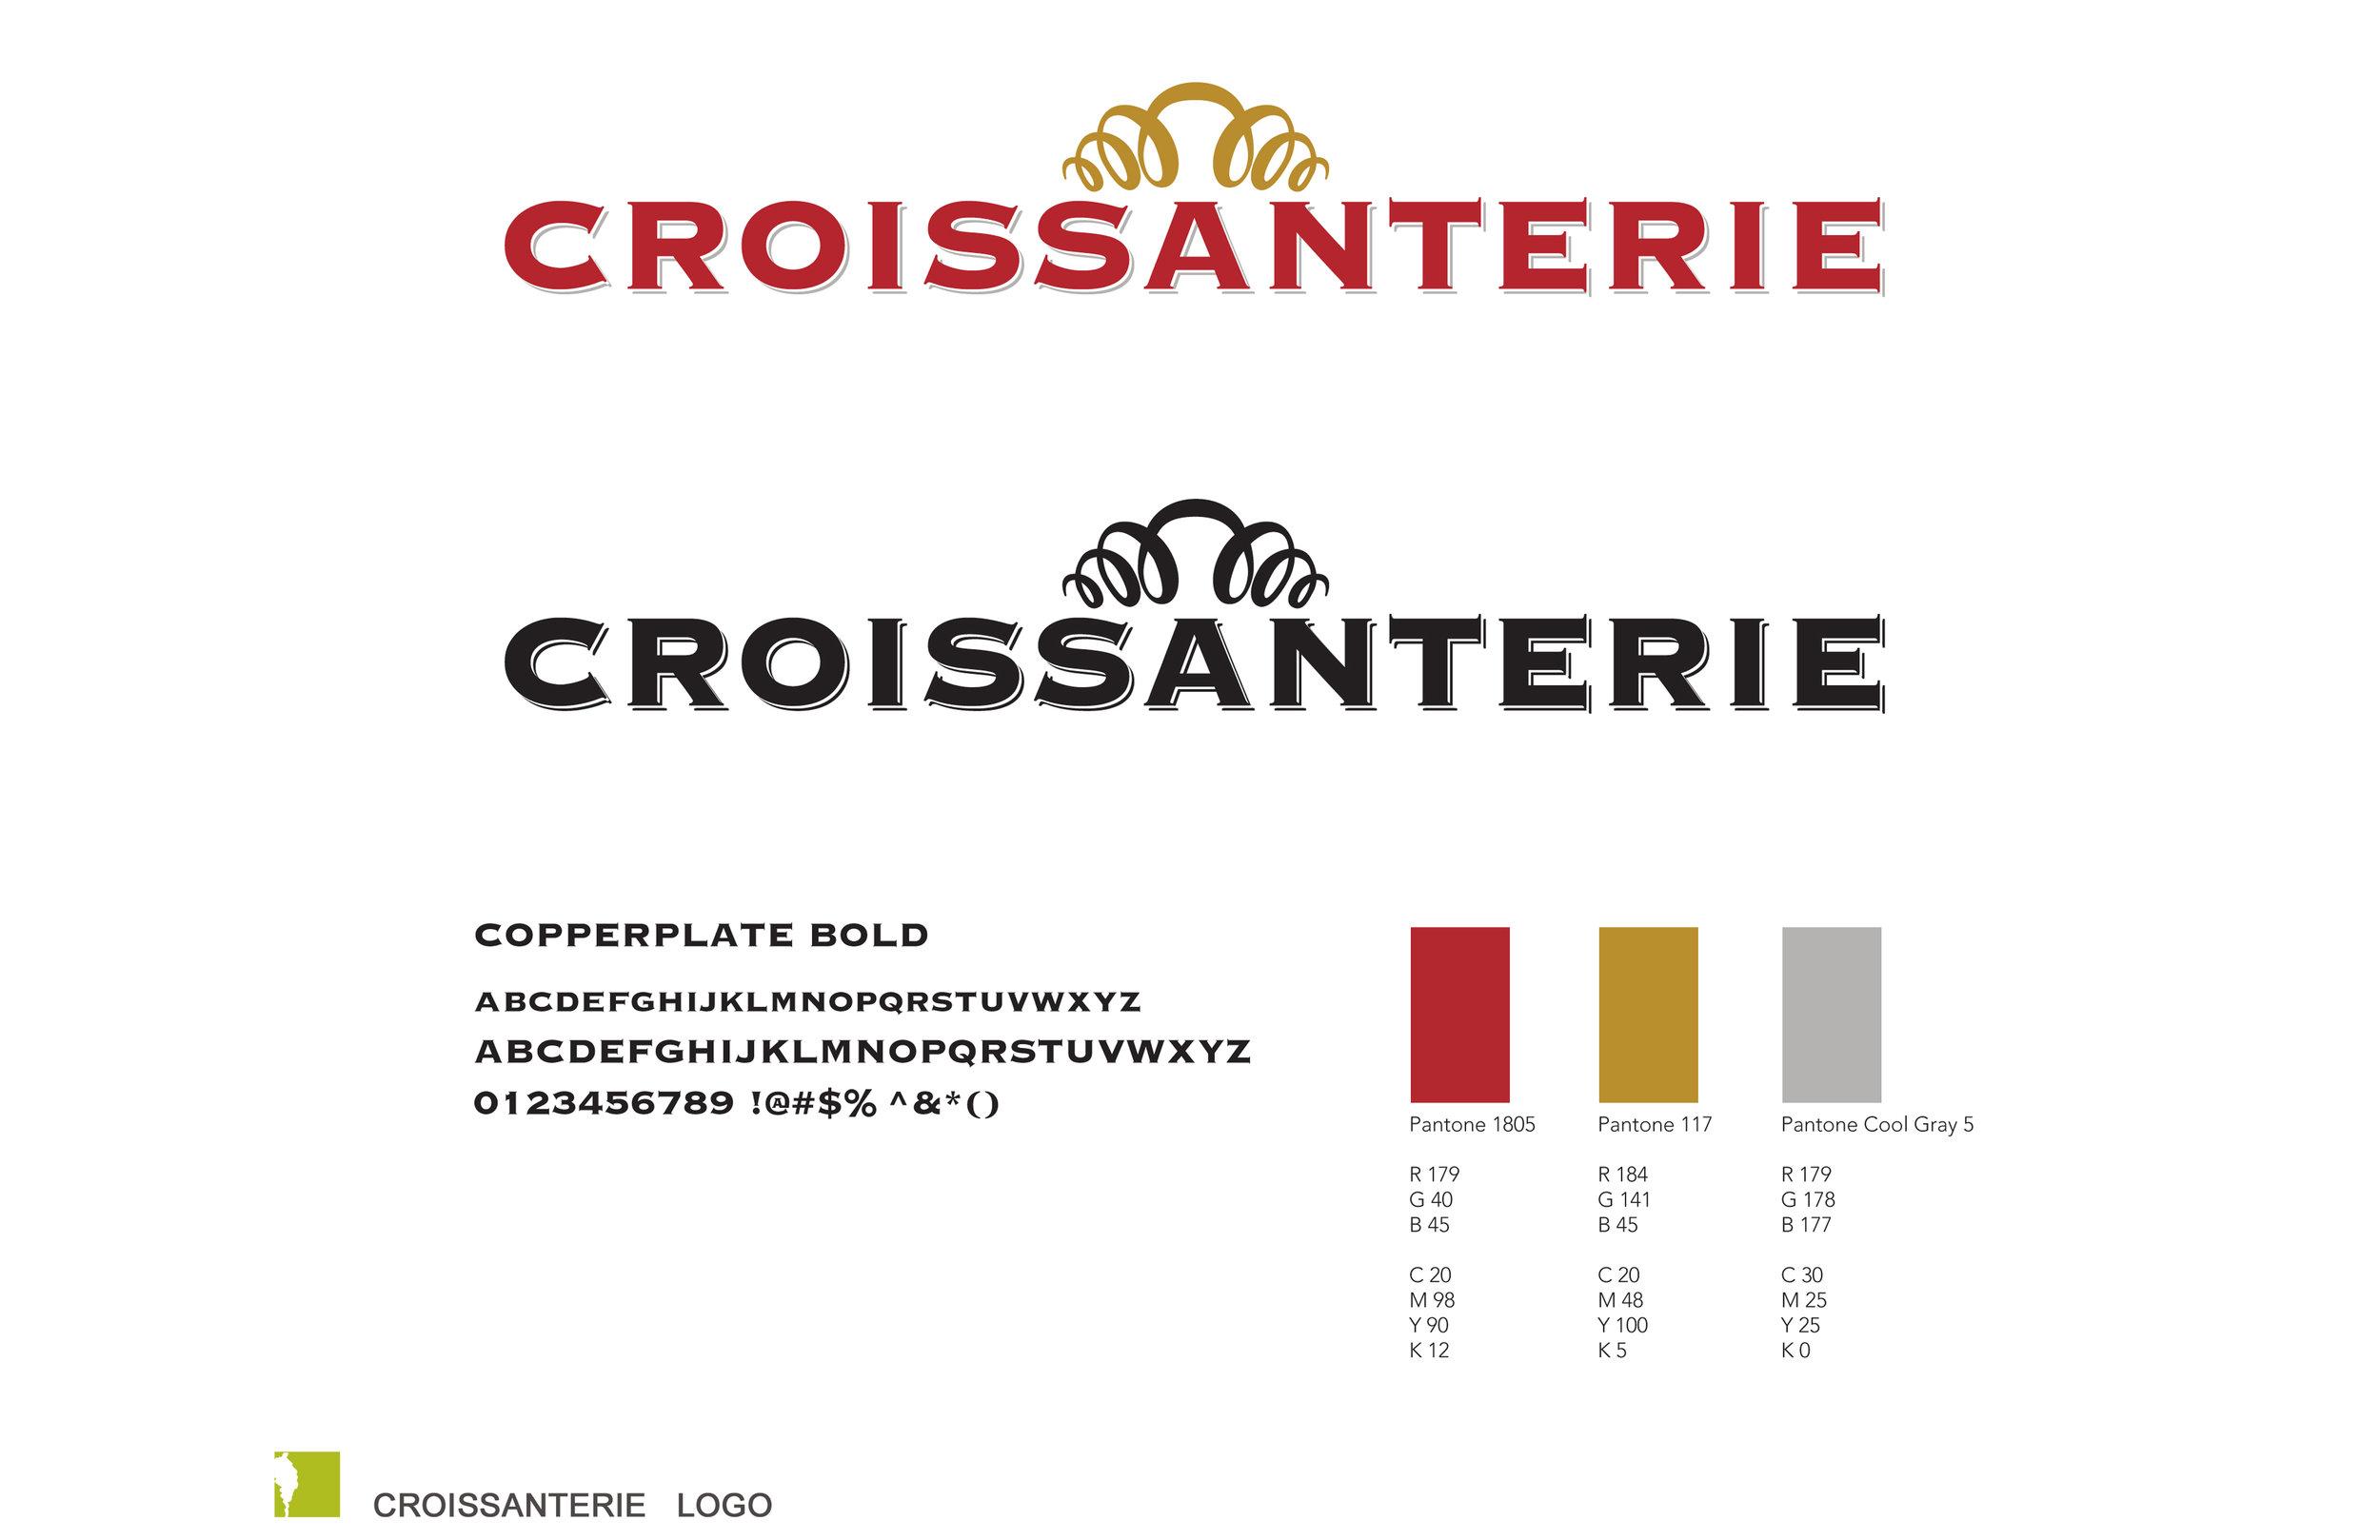 Croissanterie.jpg